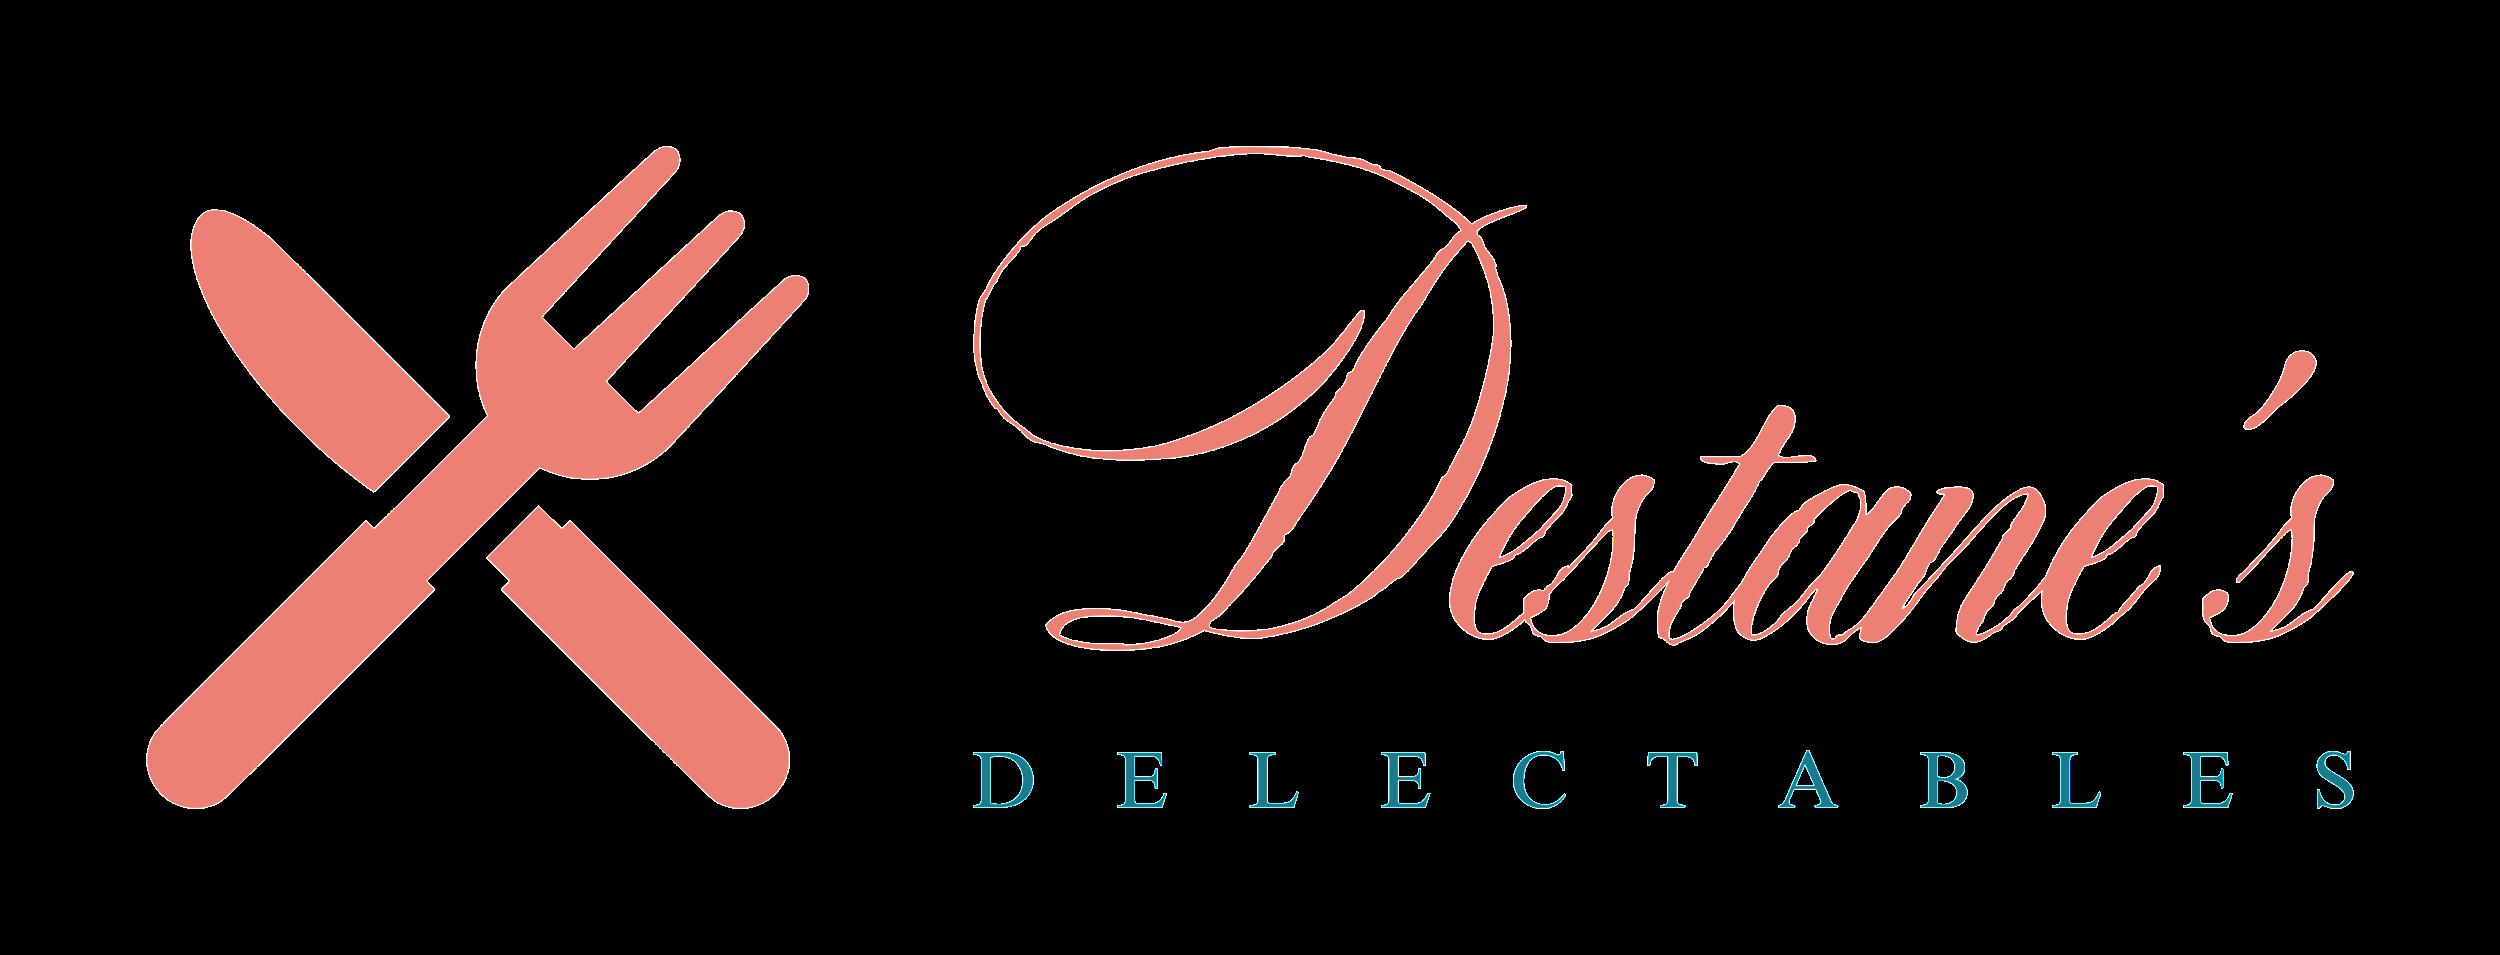 Destane – Destane's Delectables